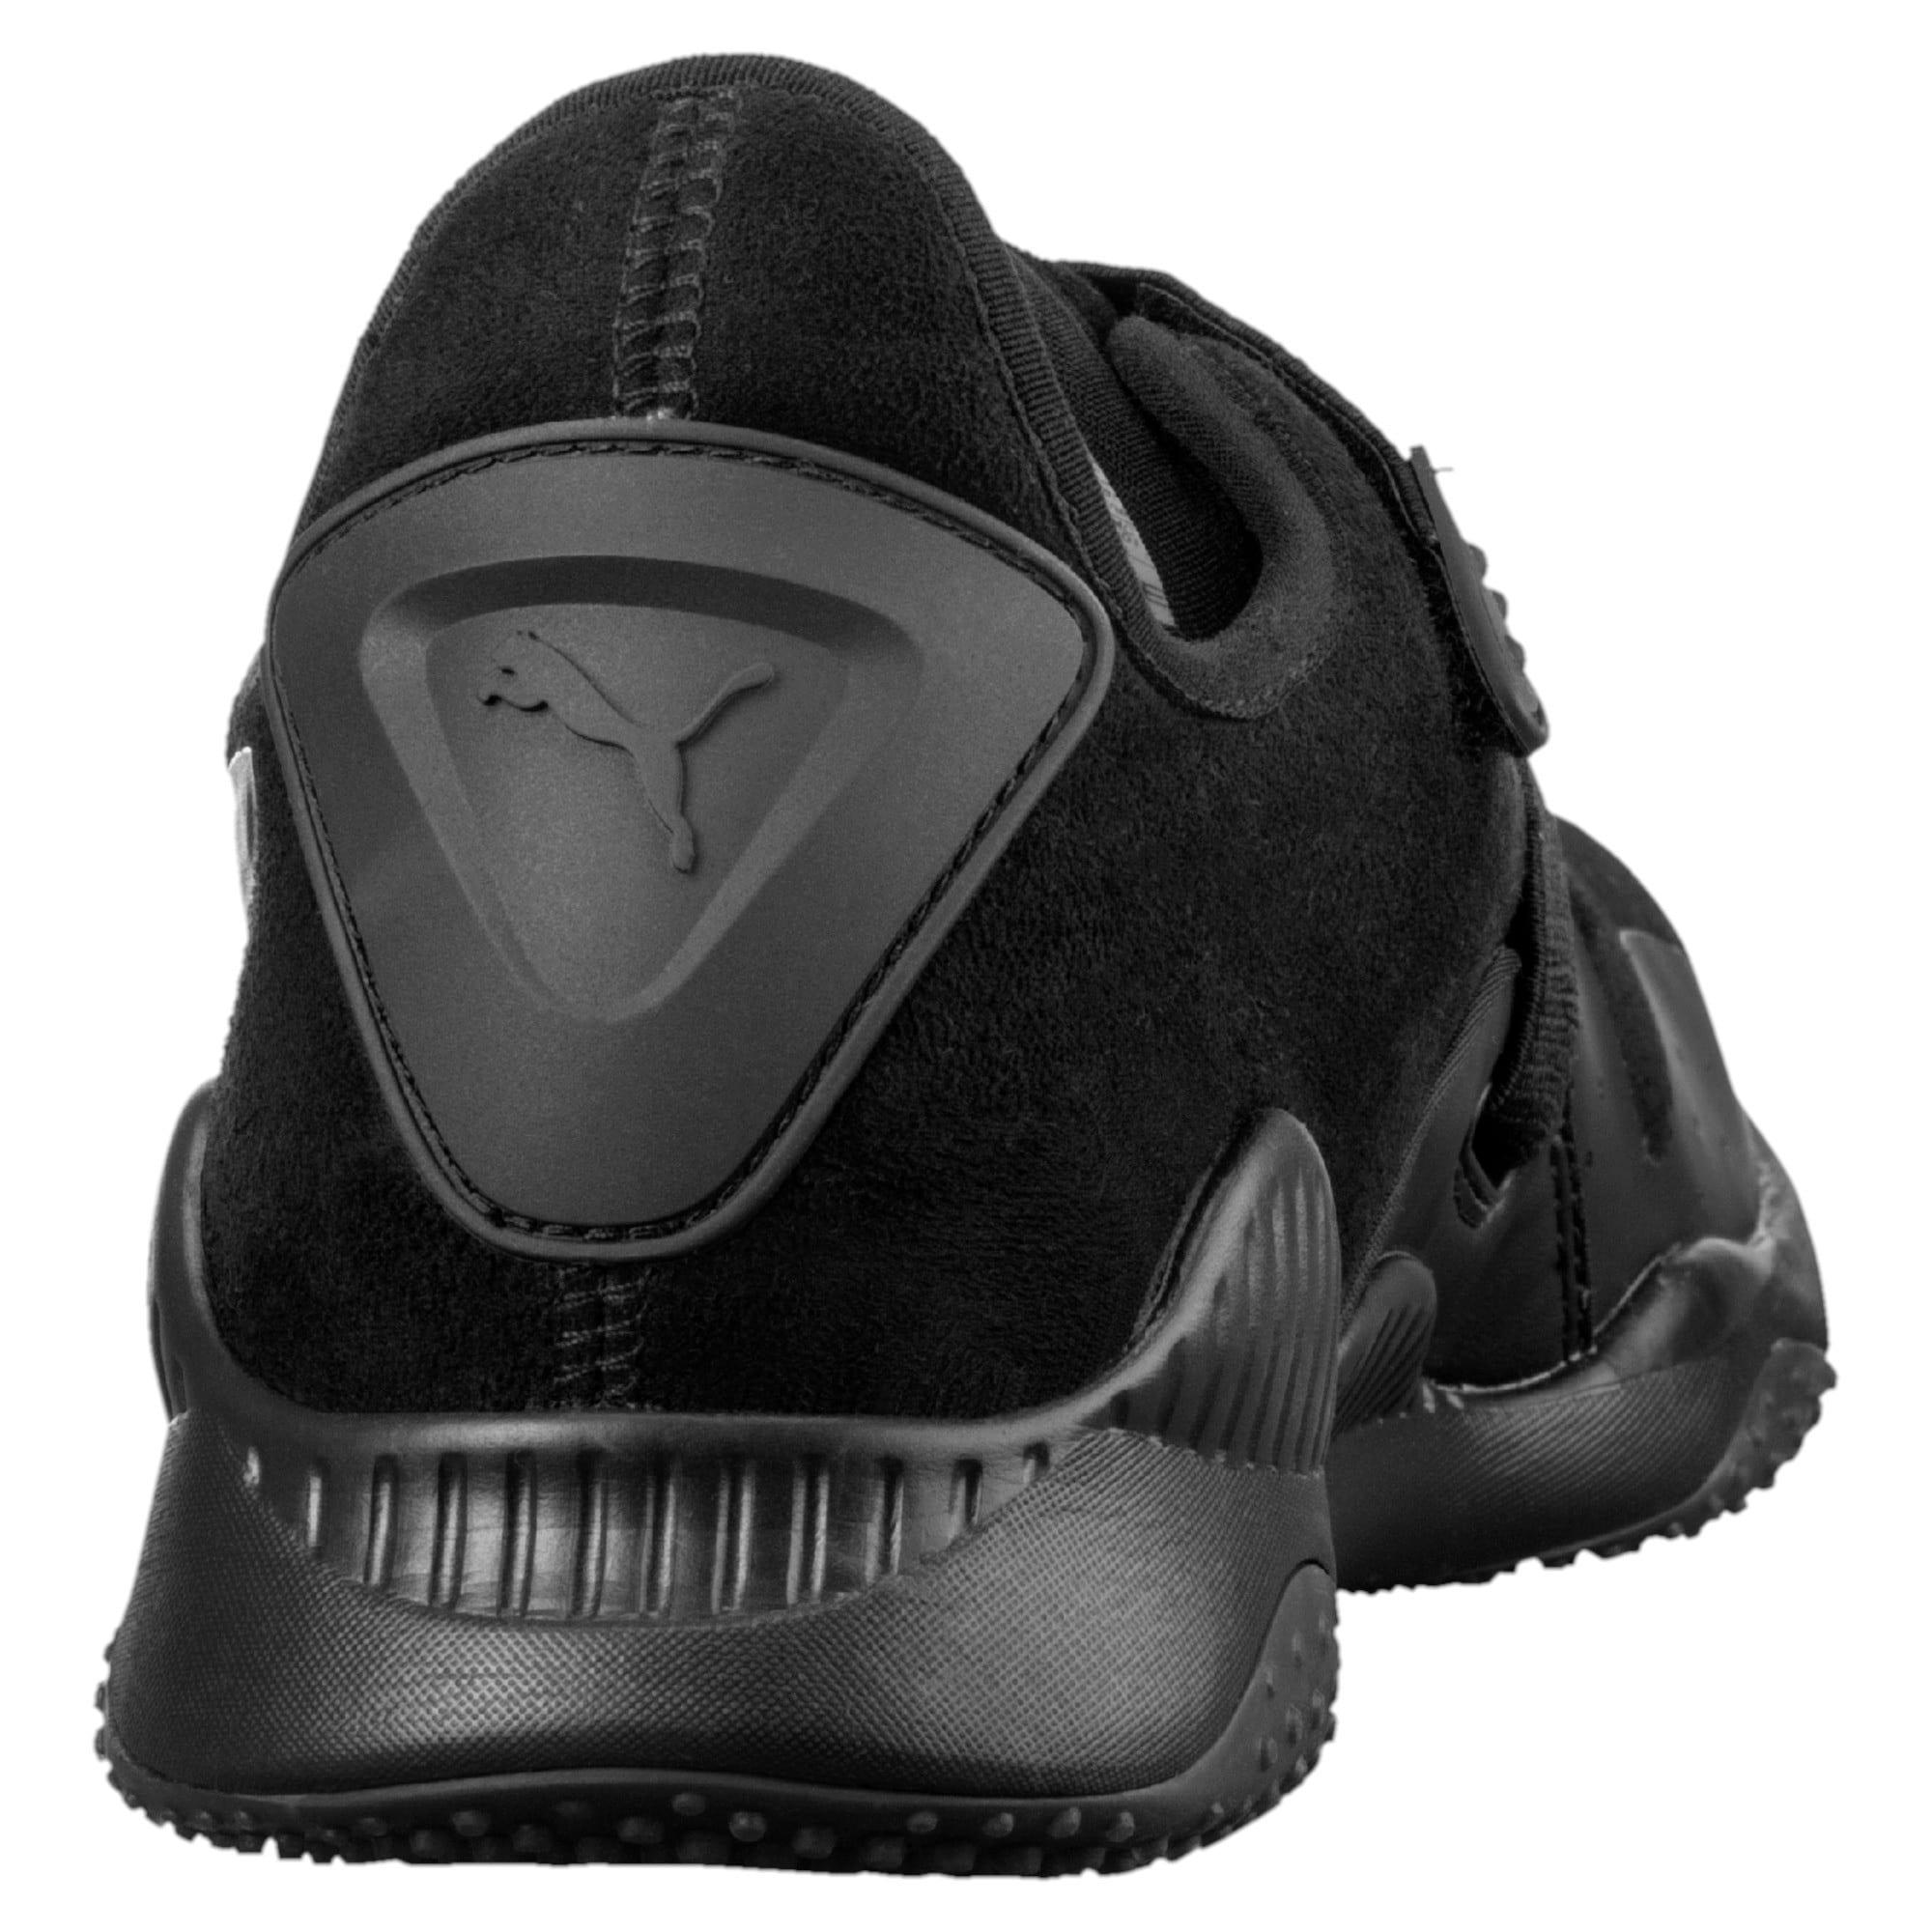 Thumbnail 3 of Mostro Hypernature Trainers, Puma Black-Puma Black, medium-IND